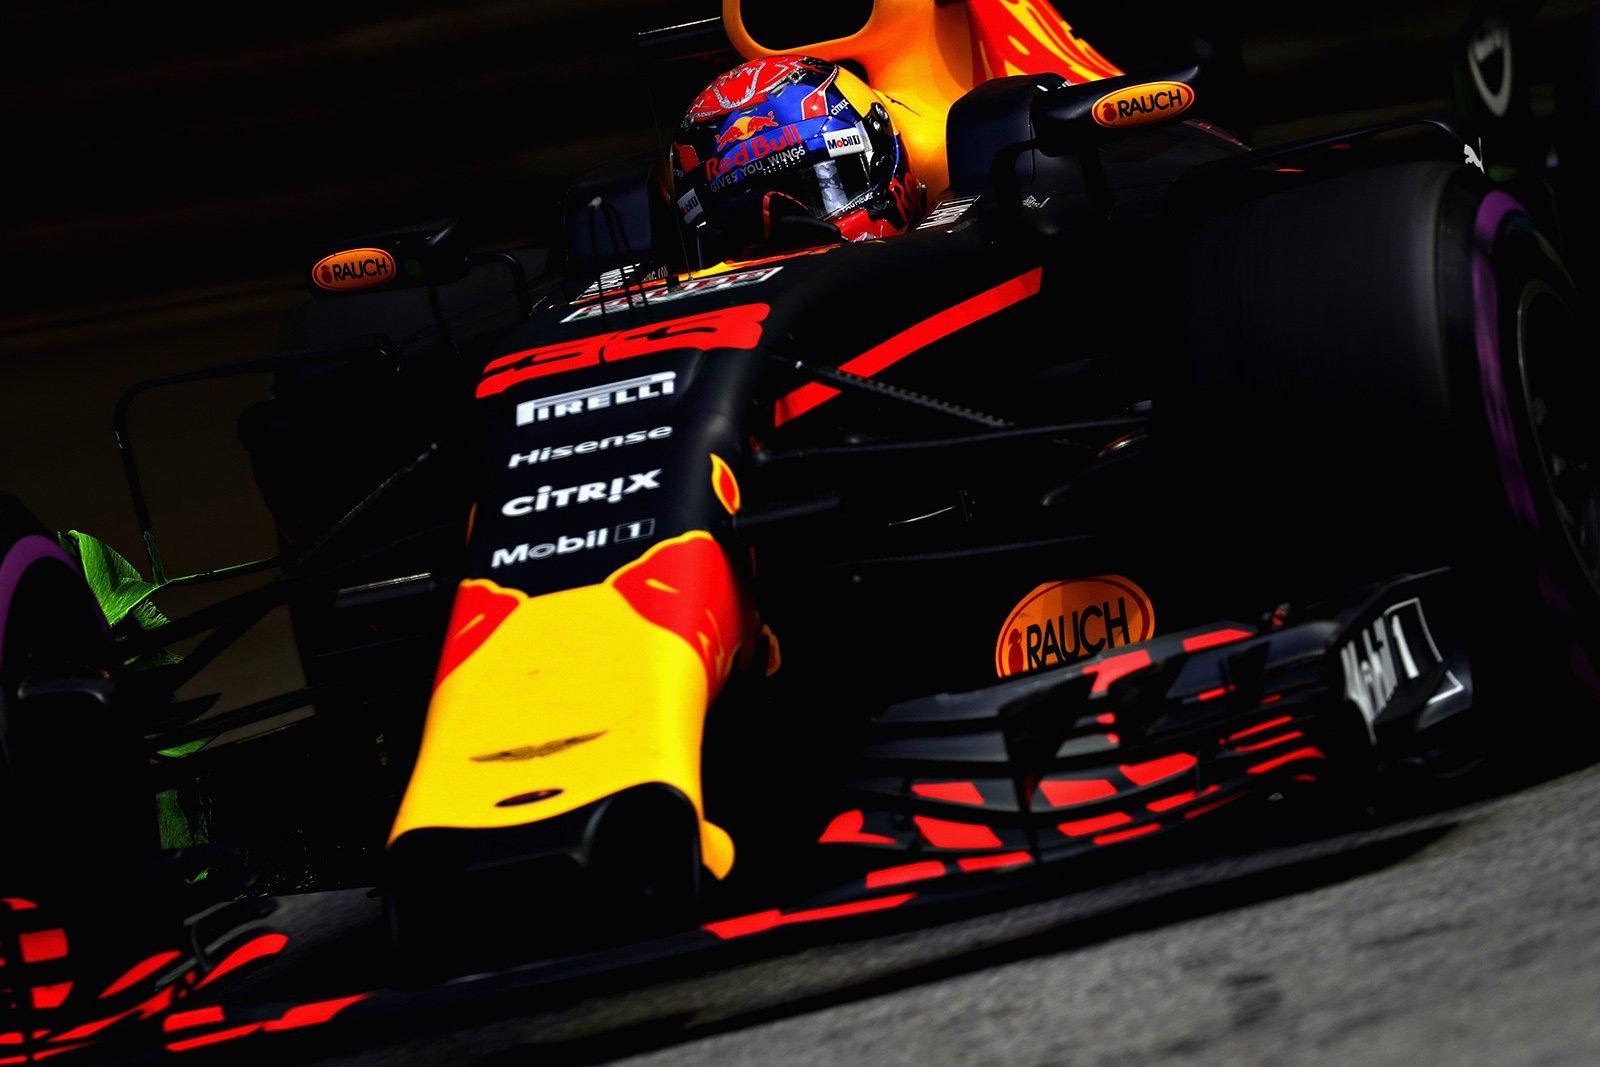 Льюис Хэмилтон одержал победу  Гран-при Сингапура